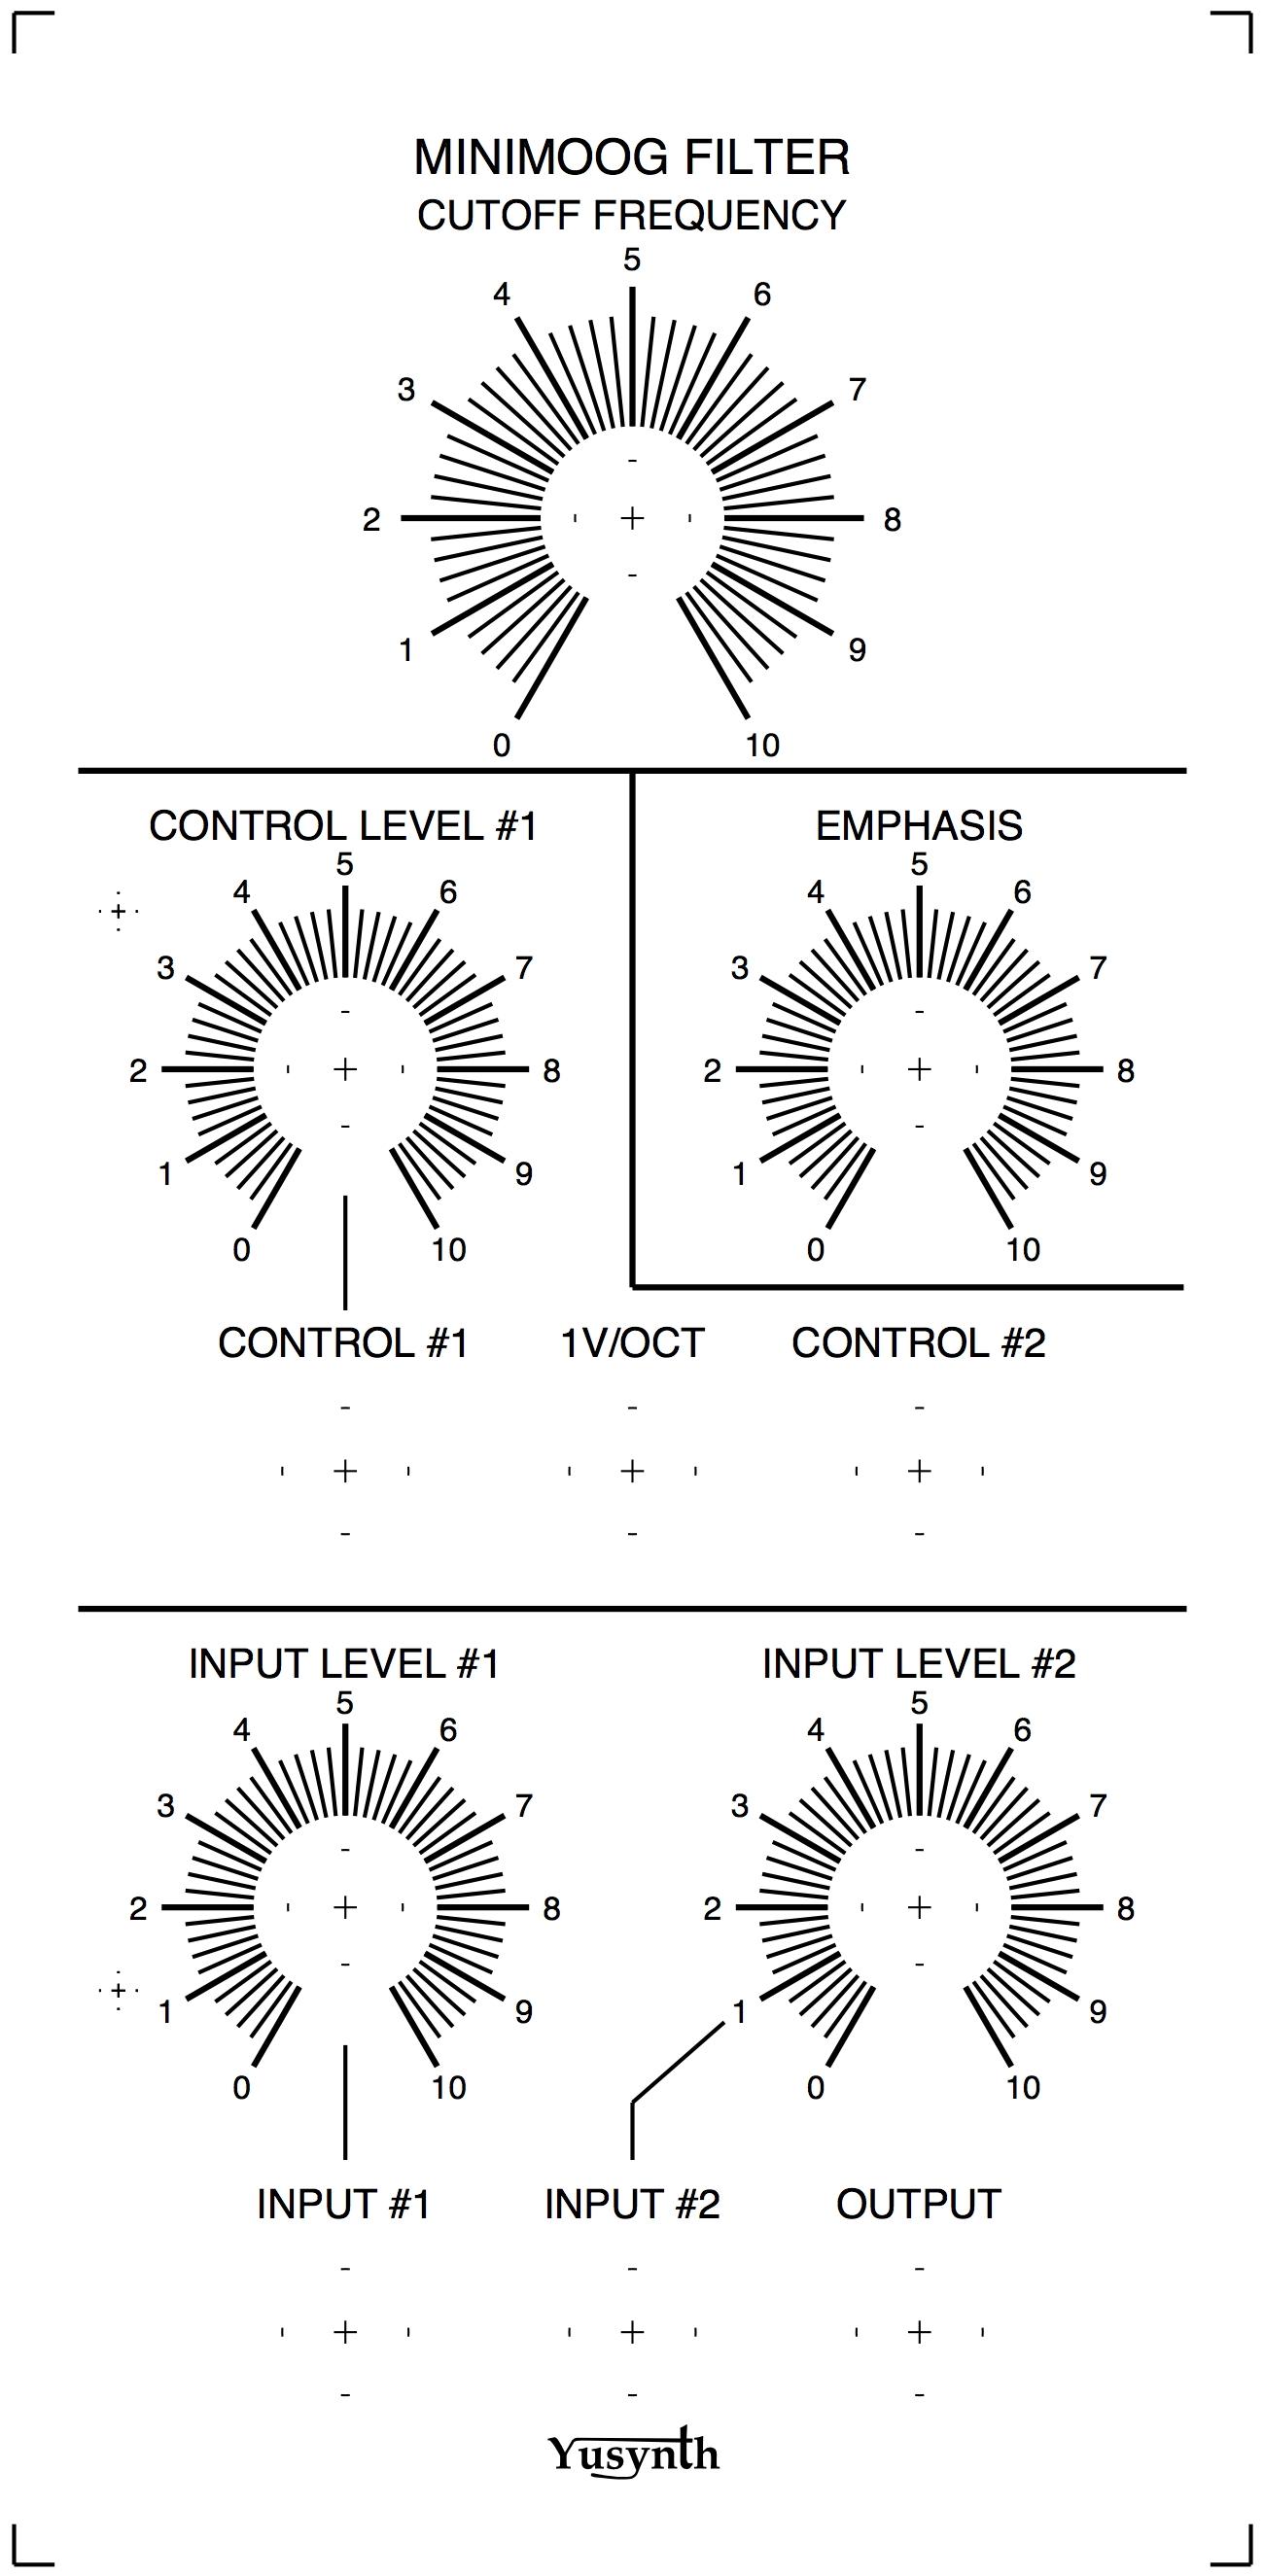 Minimoog Vcf Clone C14 Wiring Diagram Component Layout